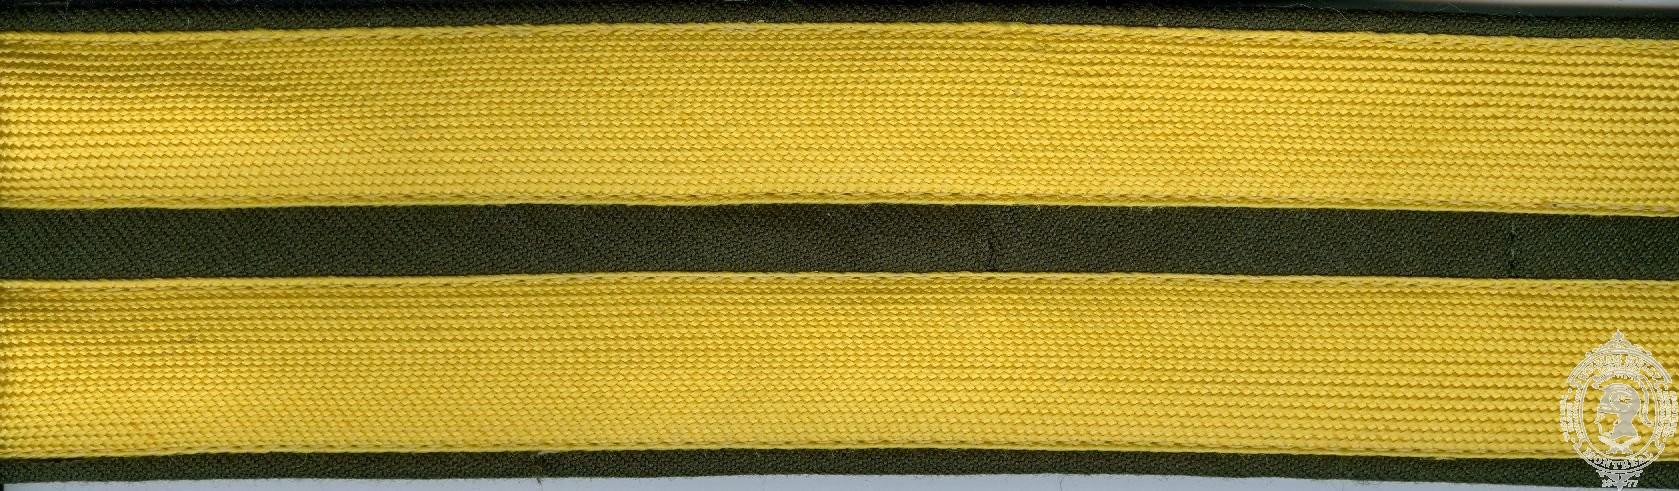 Custom Ceremonial Belt No. 3